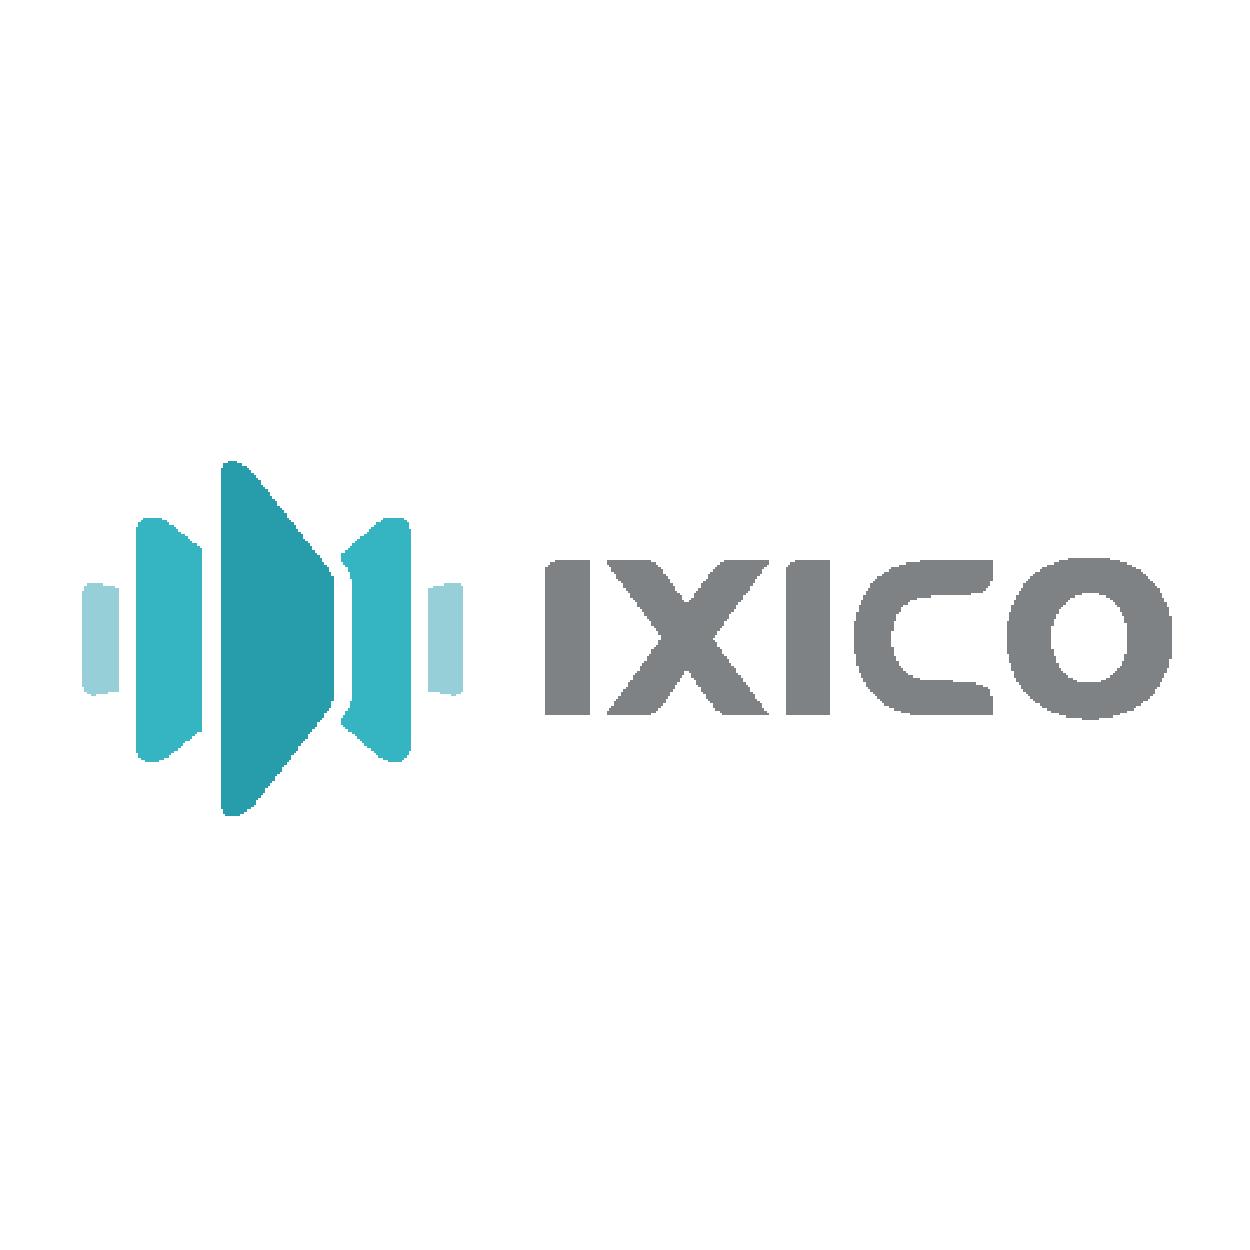 Ixico